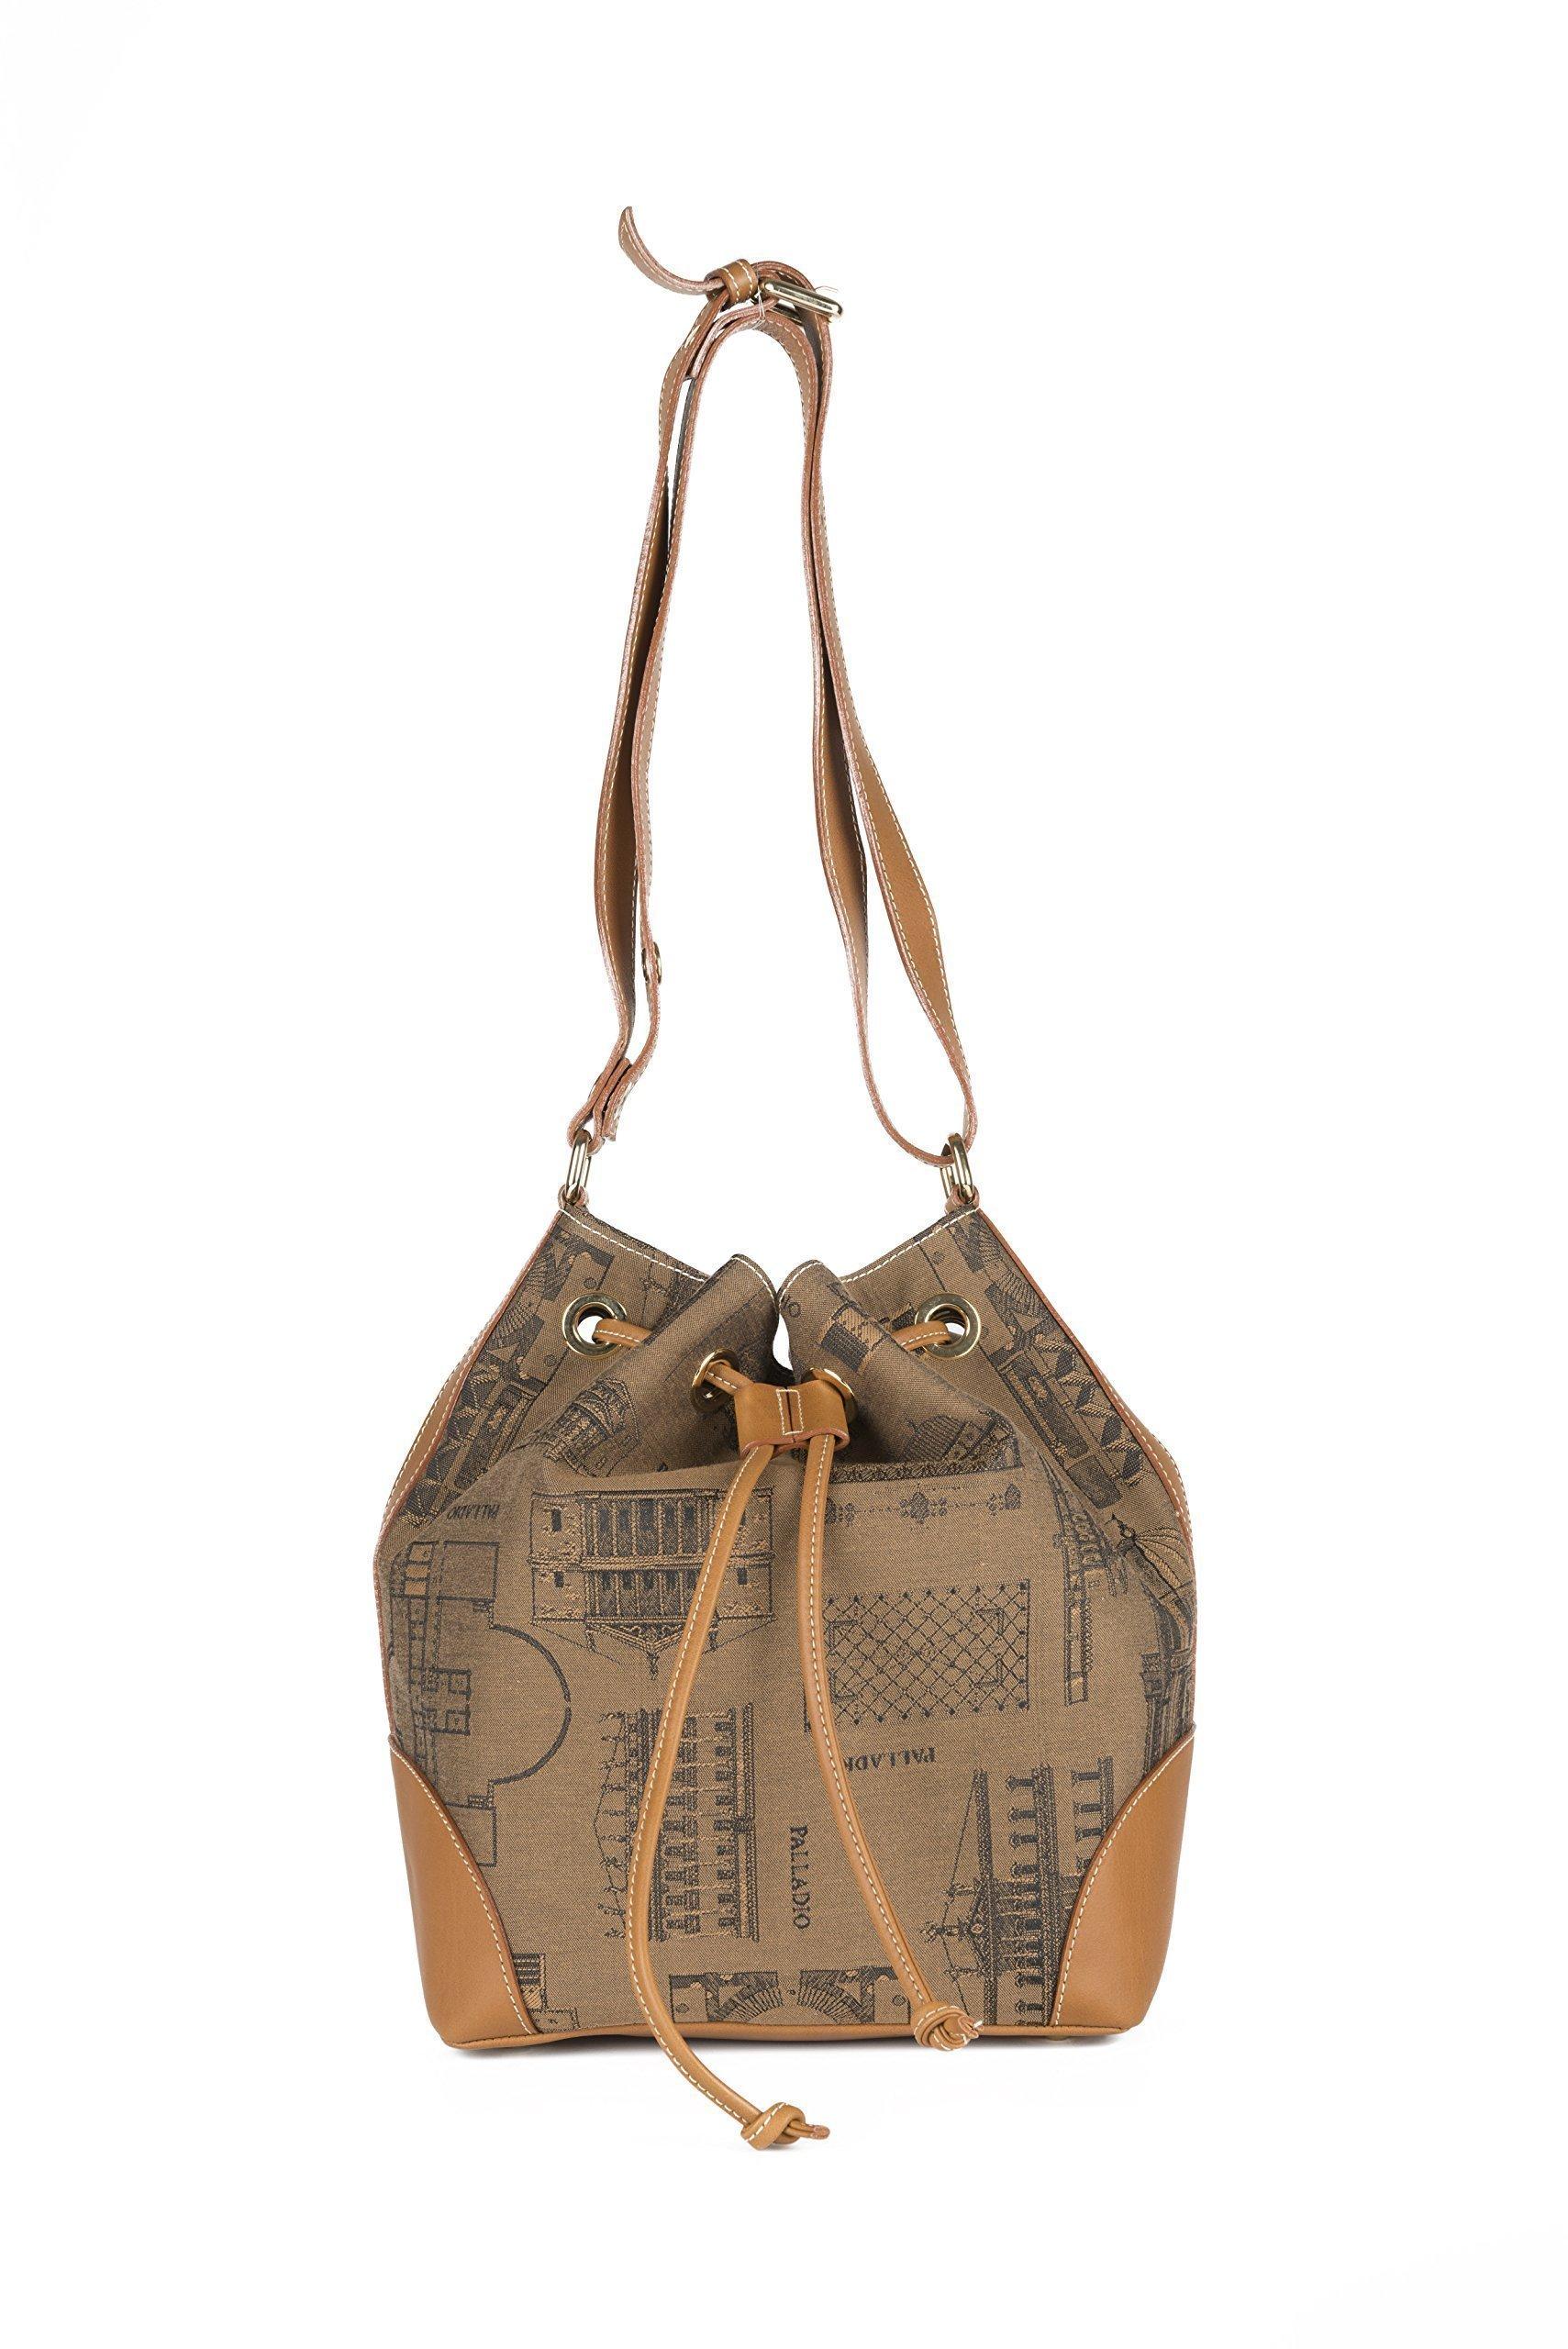 PALLADIObags, borsa villa Cordellina (bucket bag). Made in Italy - handmade-bags